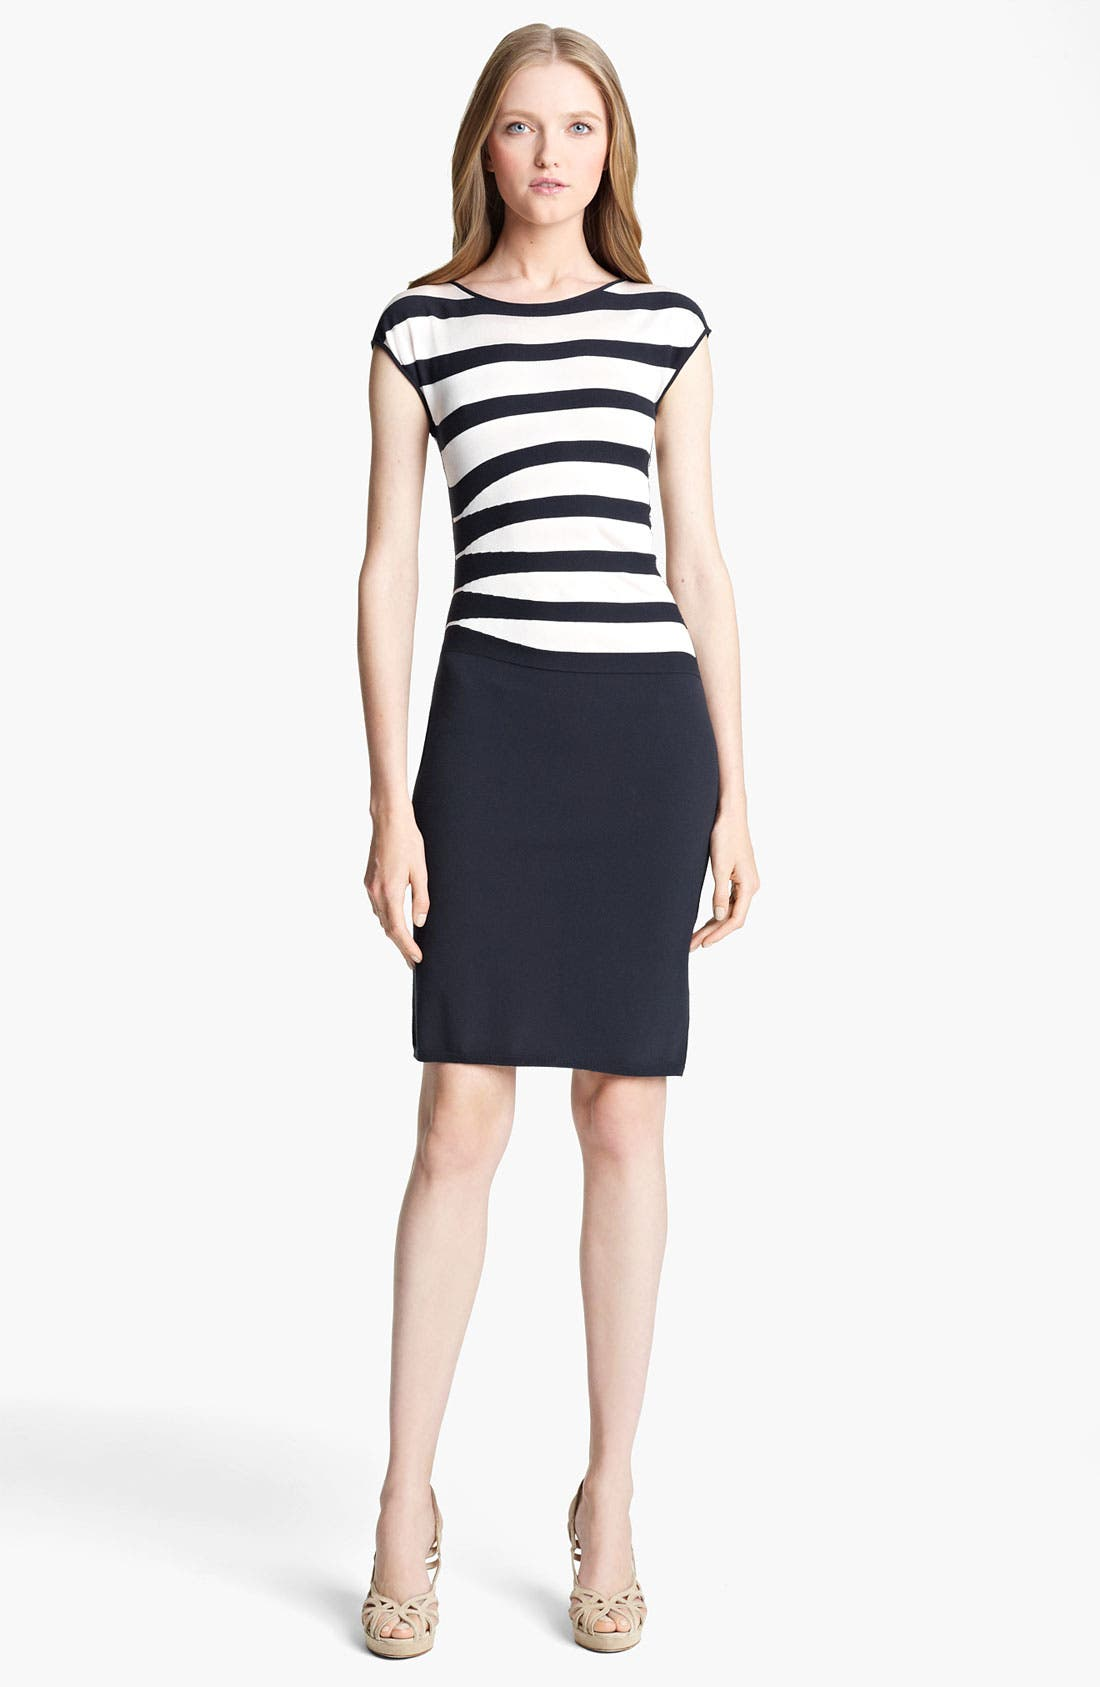 Alternate Image 1 Selected - Armani Collezioni Asymmetrical Stripe Dress